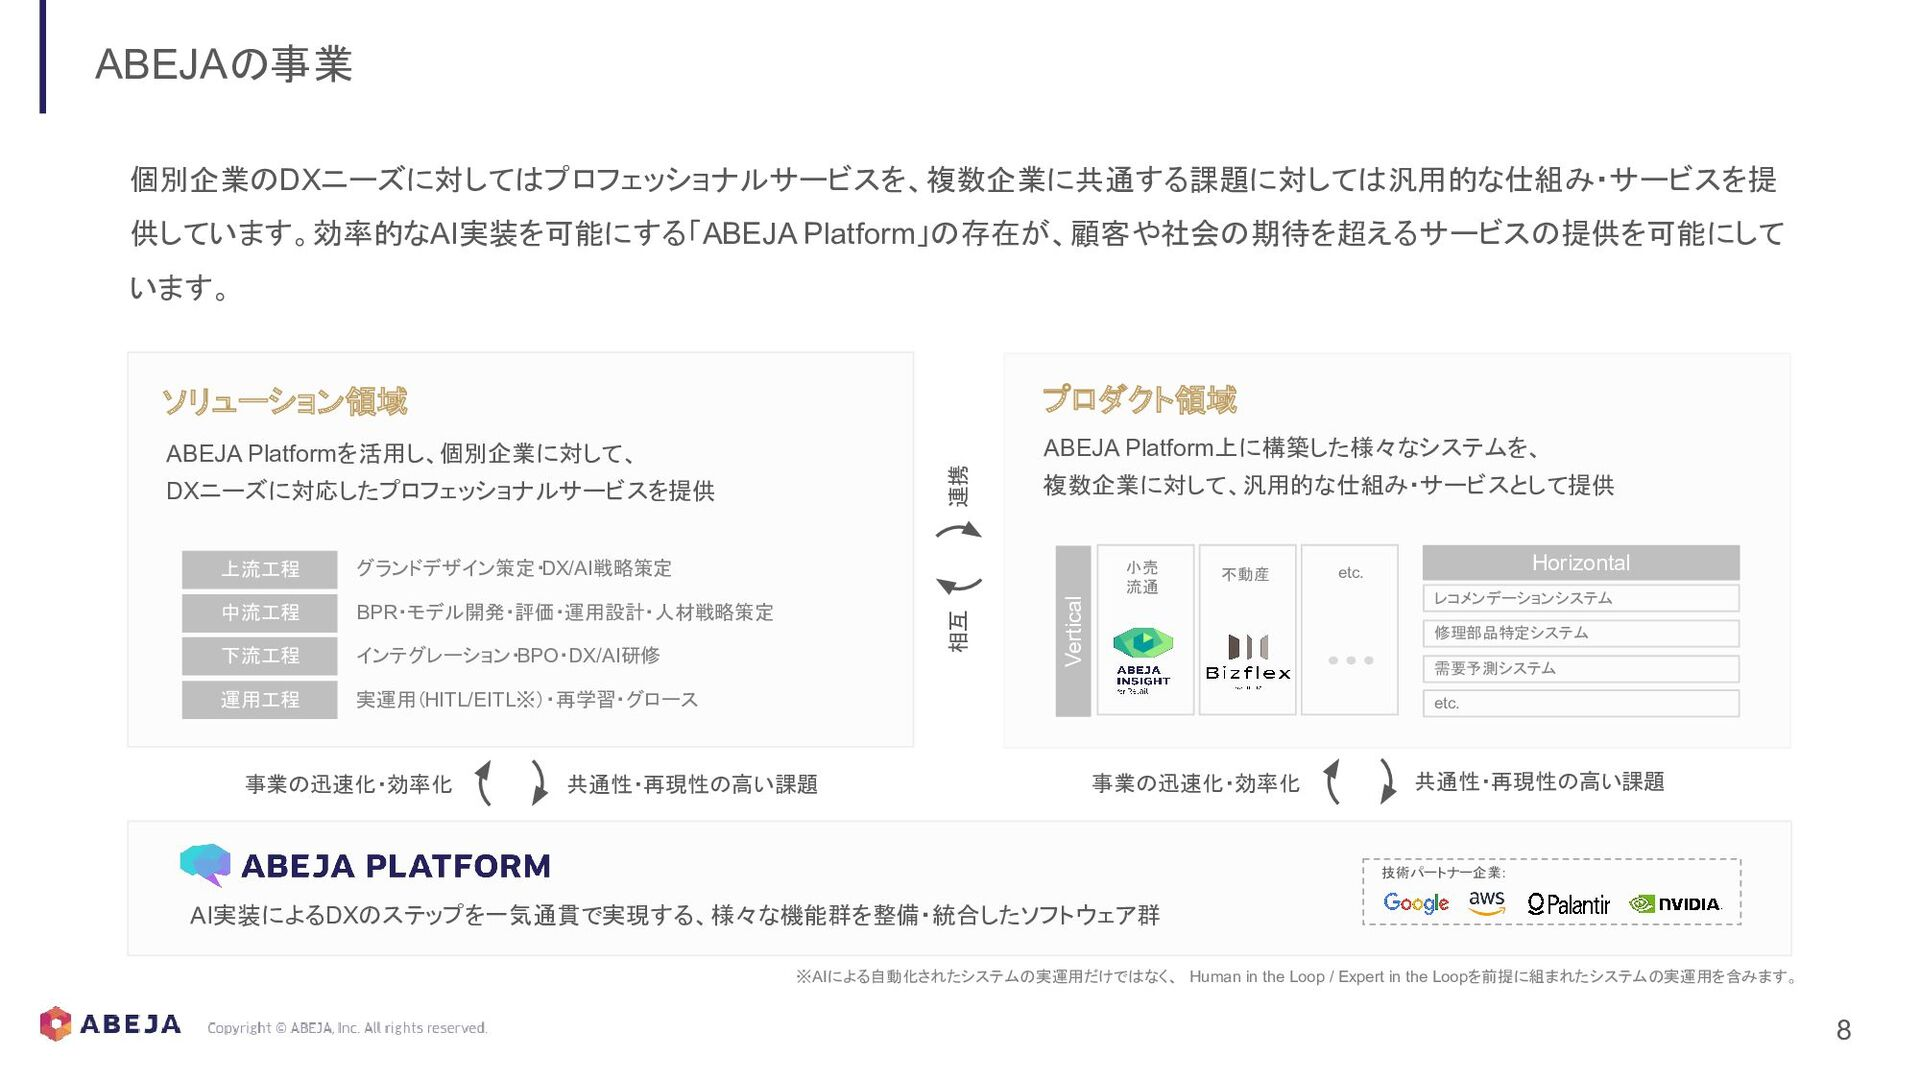 8 Google、NDIVIAなどのグローバル企業から日本国内初出資を受けていることに加え、S...